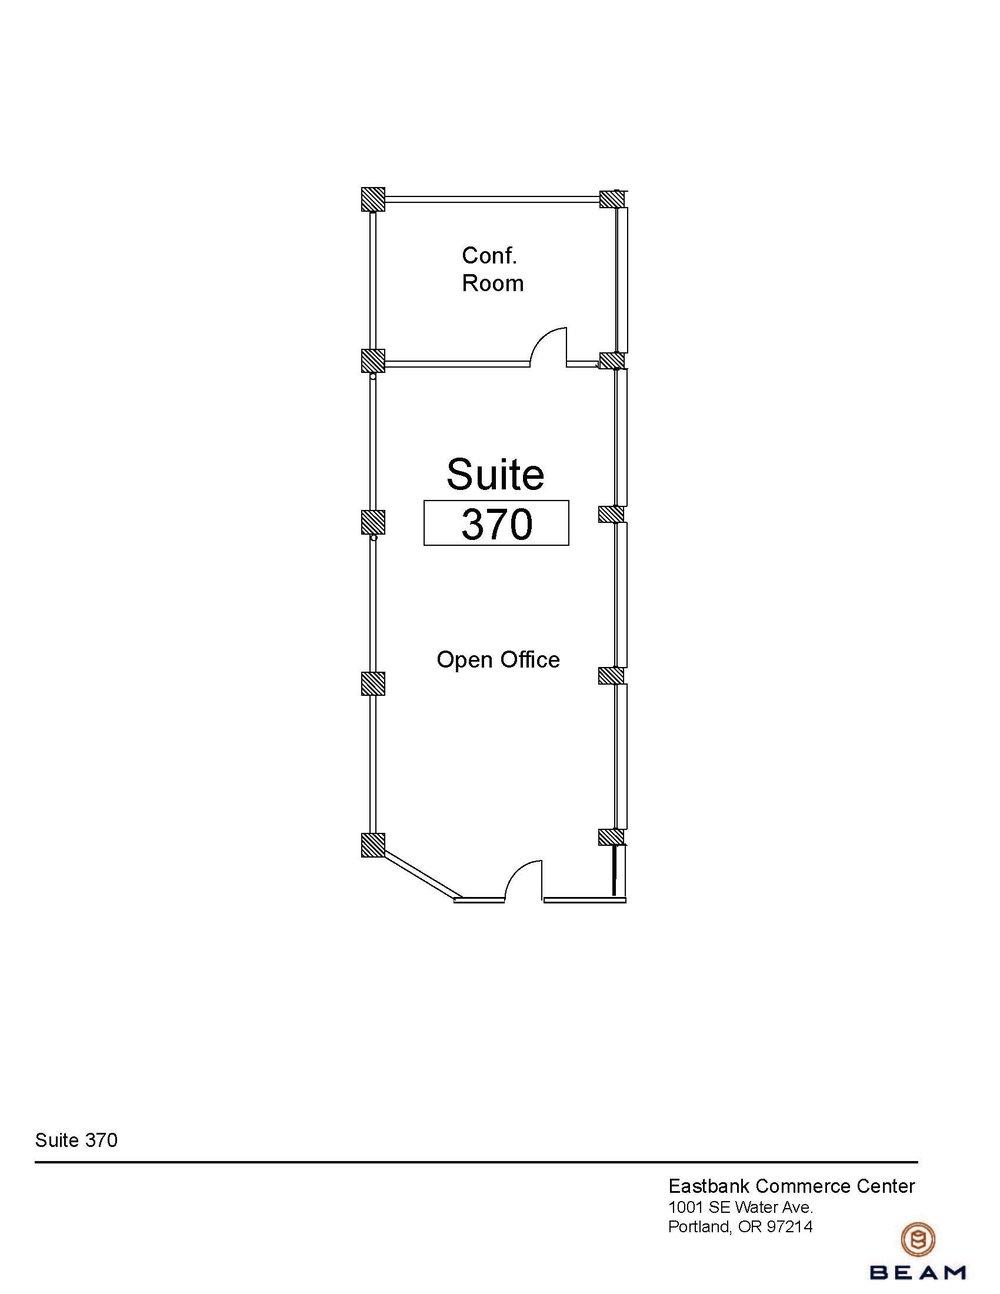 EBCC 370 Floor Plan.jpg